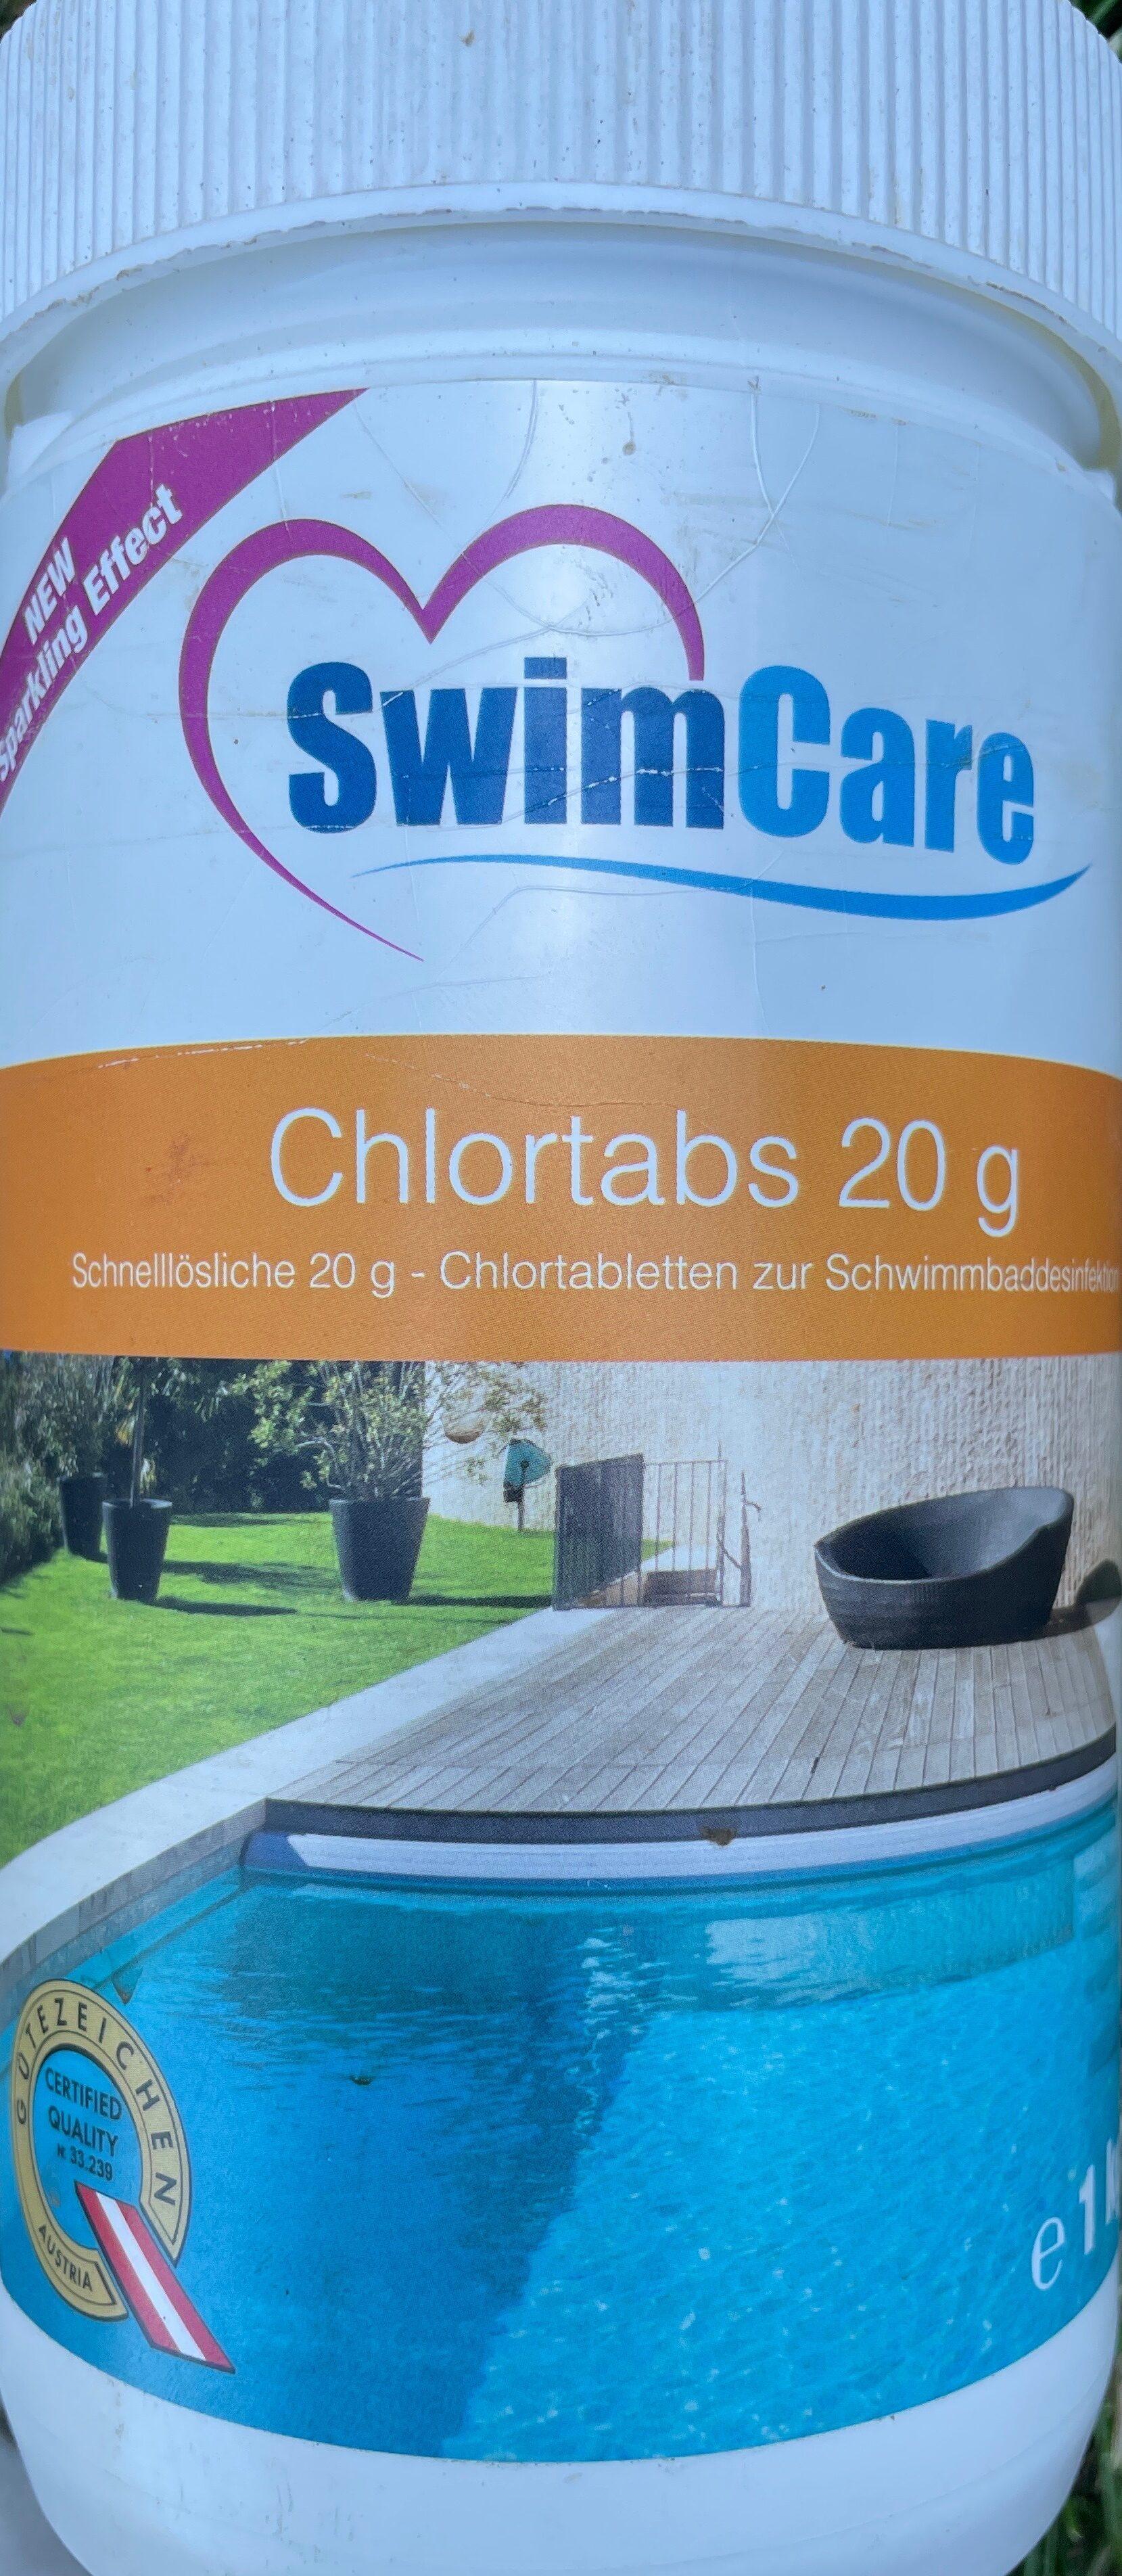 Chlortabs 20g - Product - de